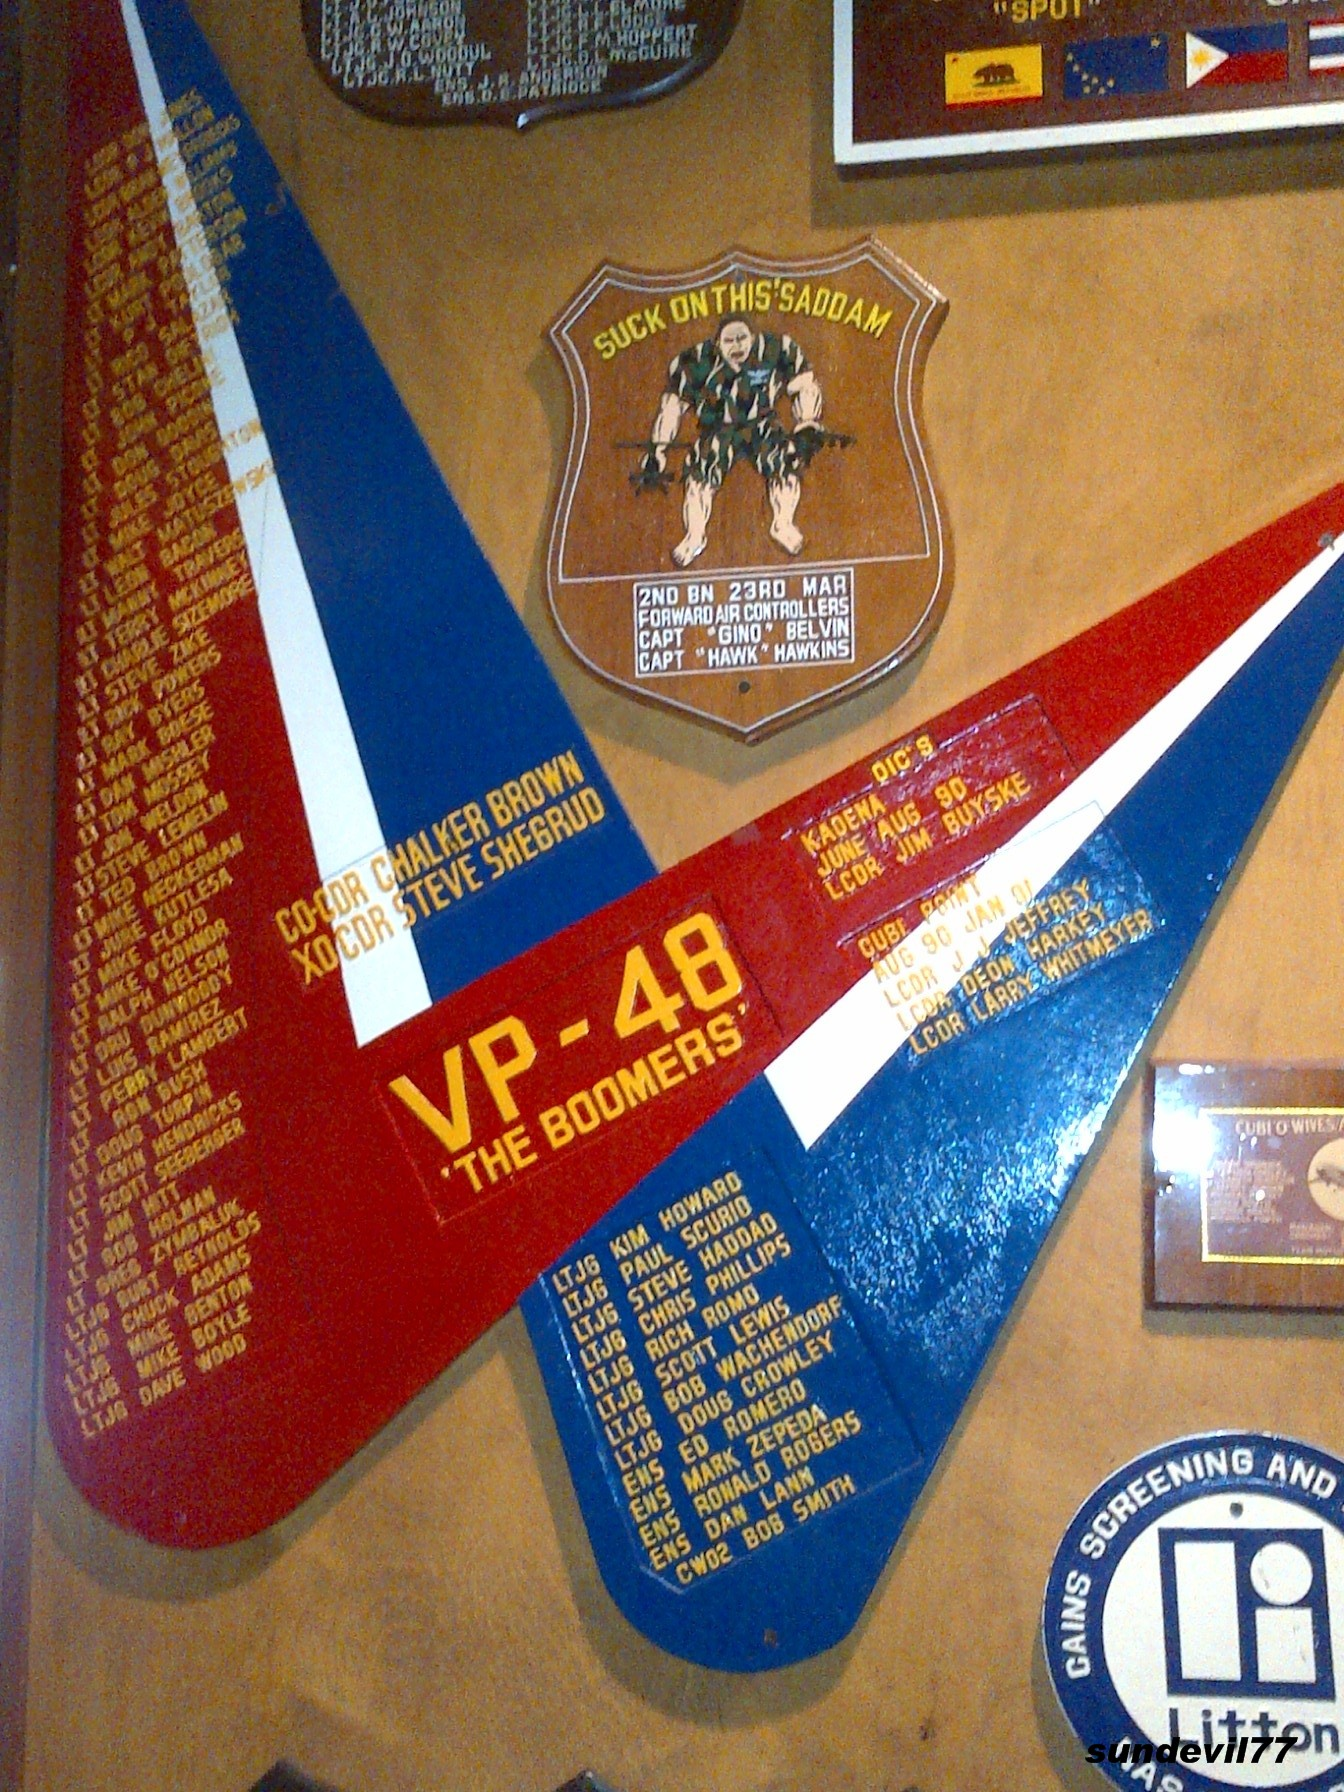 VP 40 065